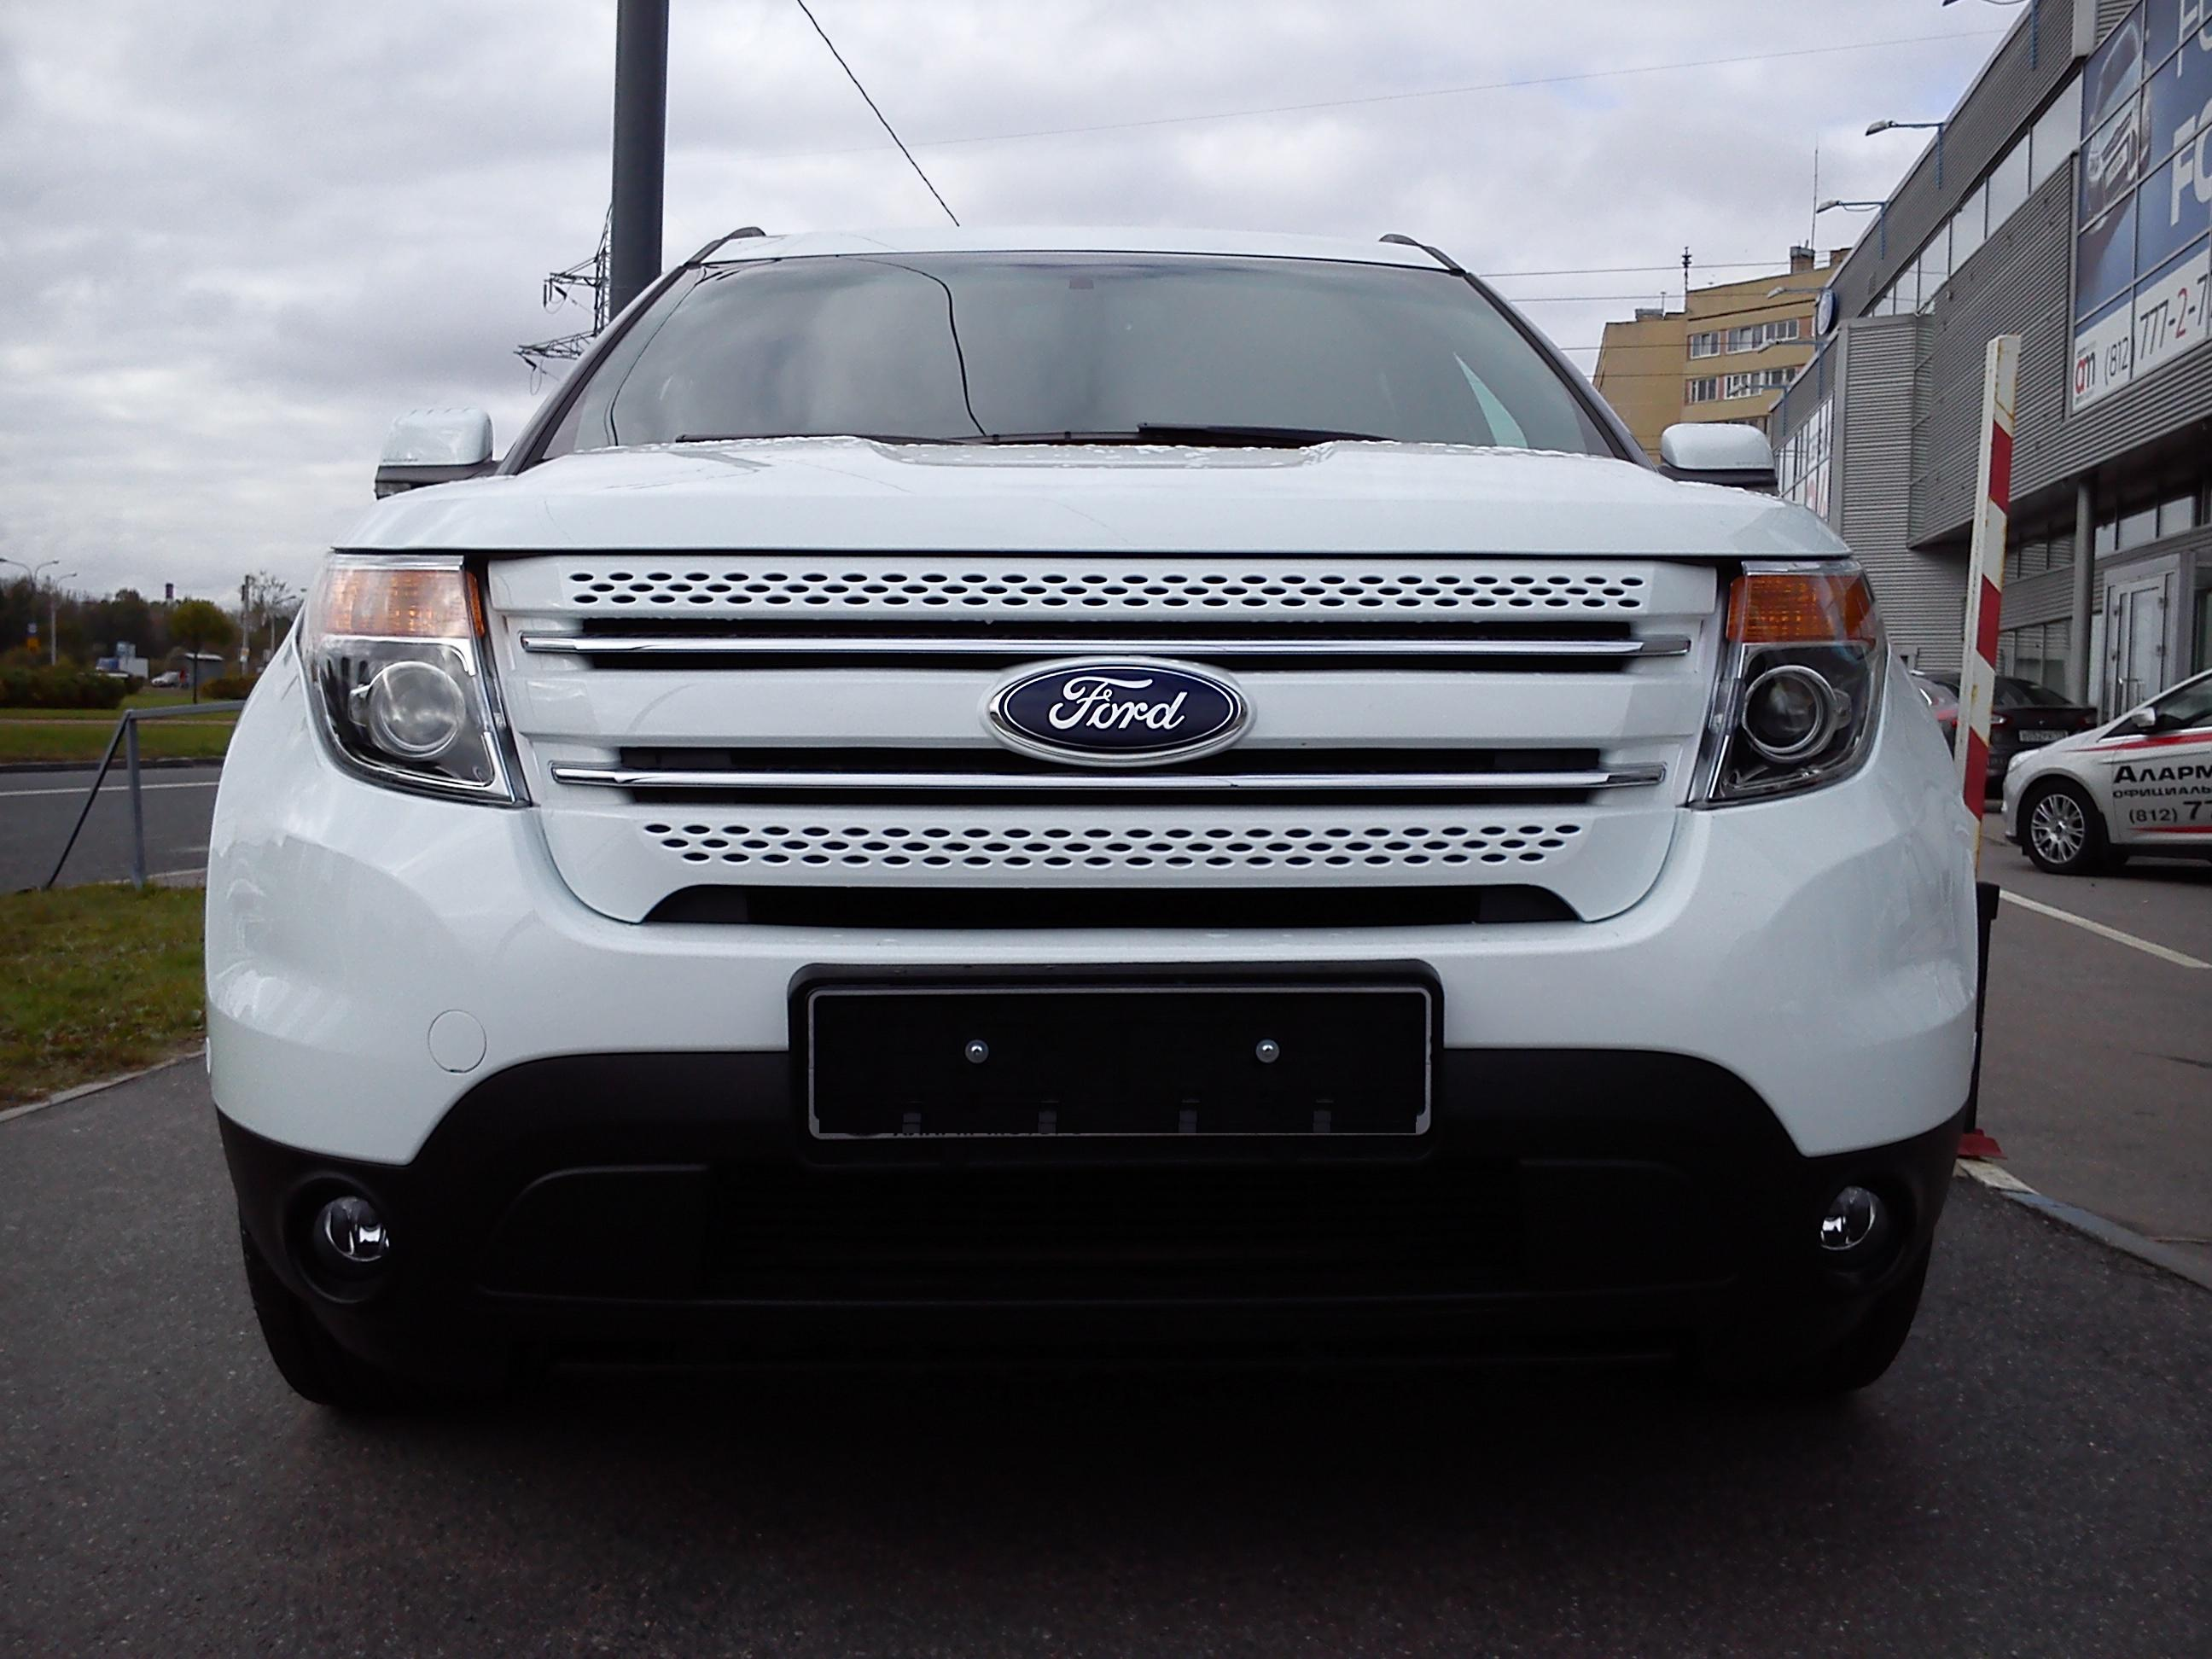 Форд лимитед 2013 фото